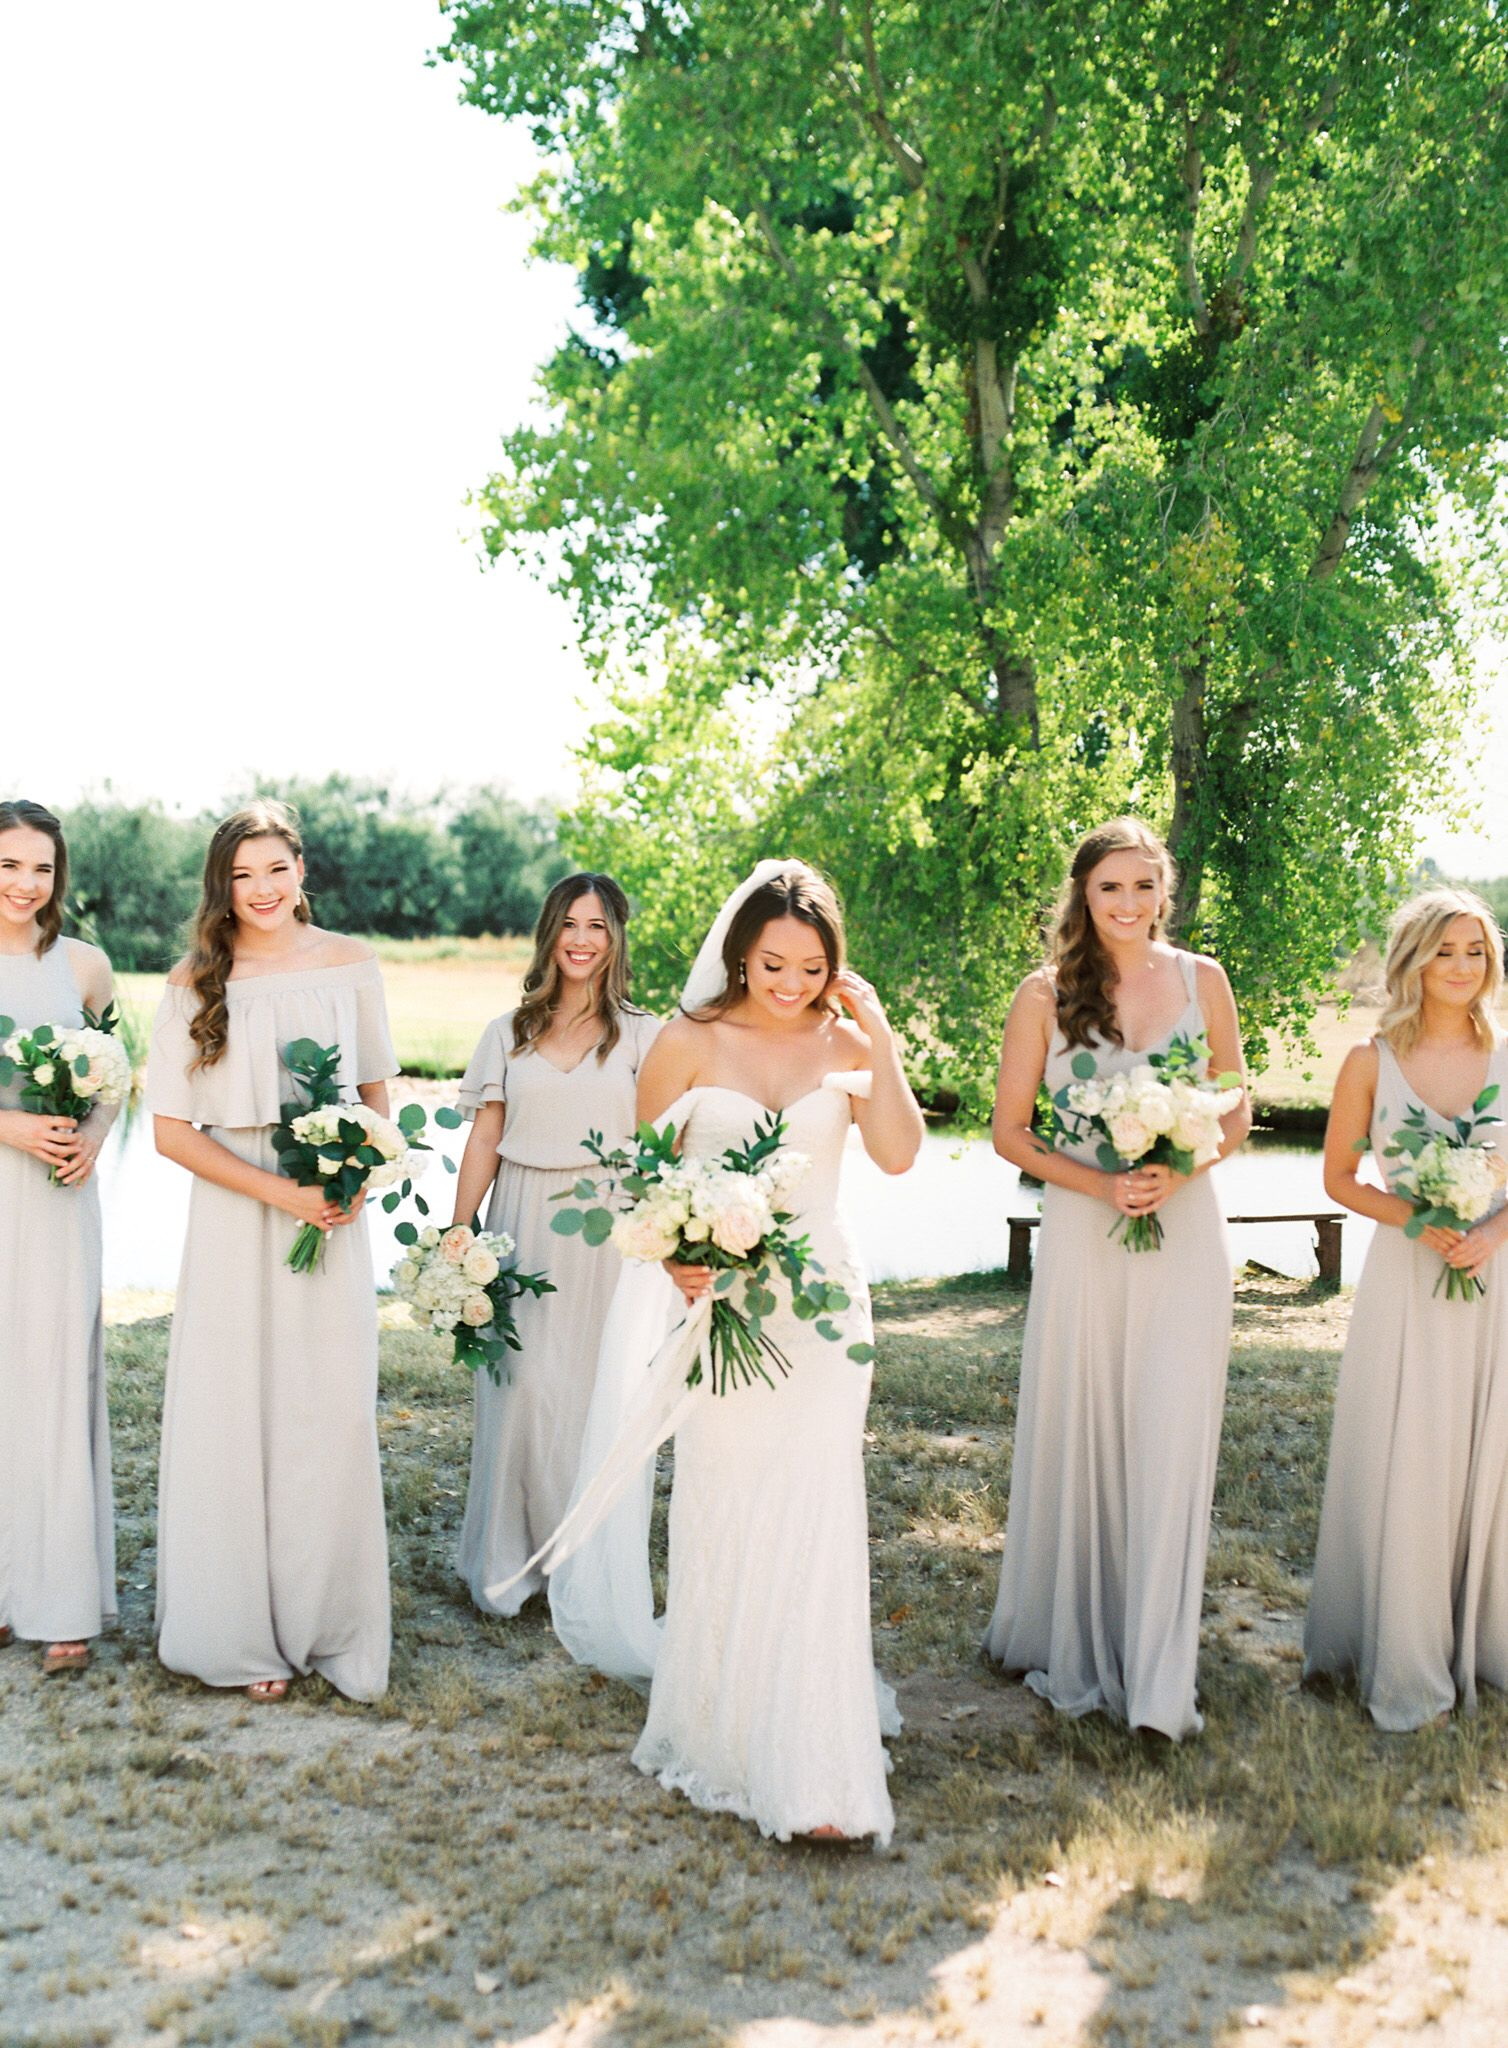 Beige Bridesmaid Dresses White And Green Wedding Off The Shoulder Lace Weddingdress Beige Wedding White Bridesmaid Dresses Beige Bridesmaid Dress [ 2048 x 1508 Pixel ]